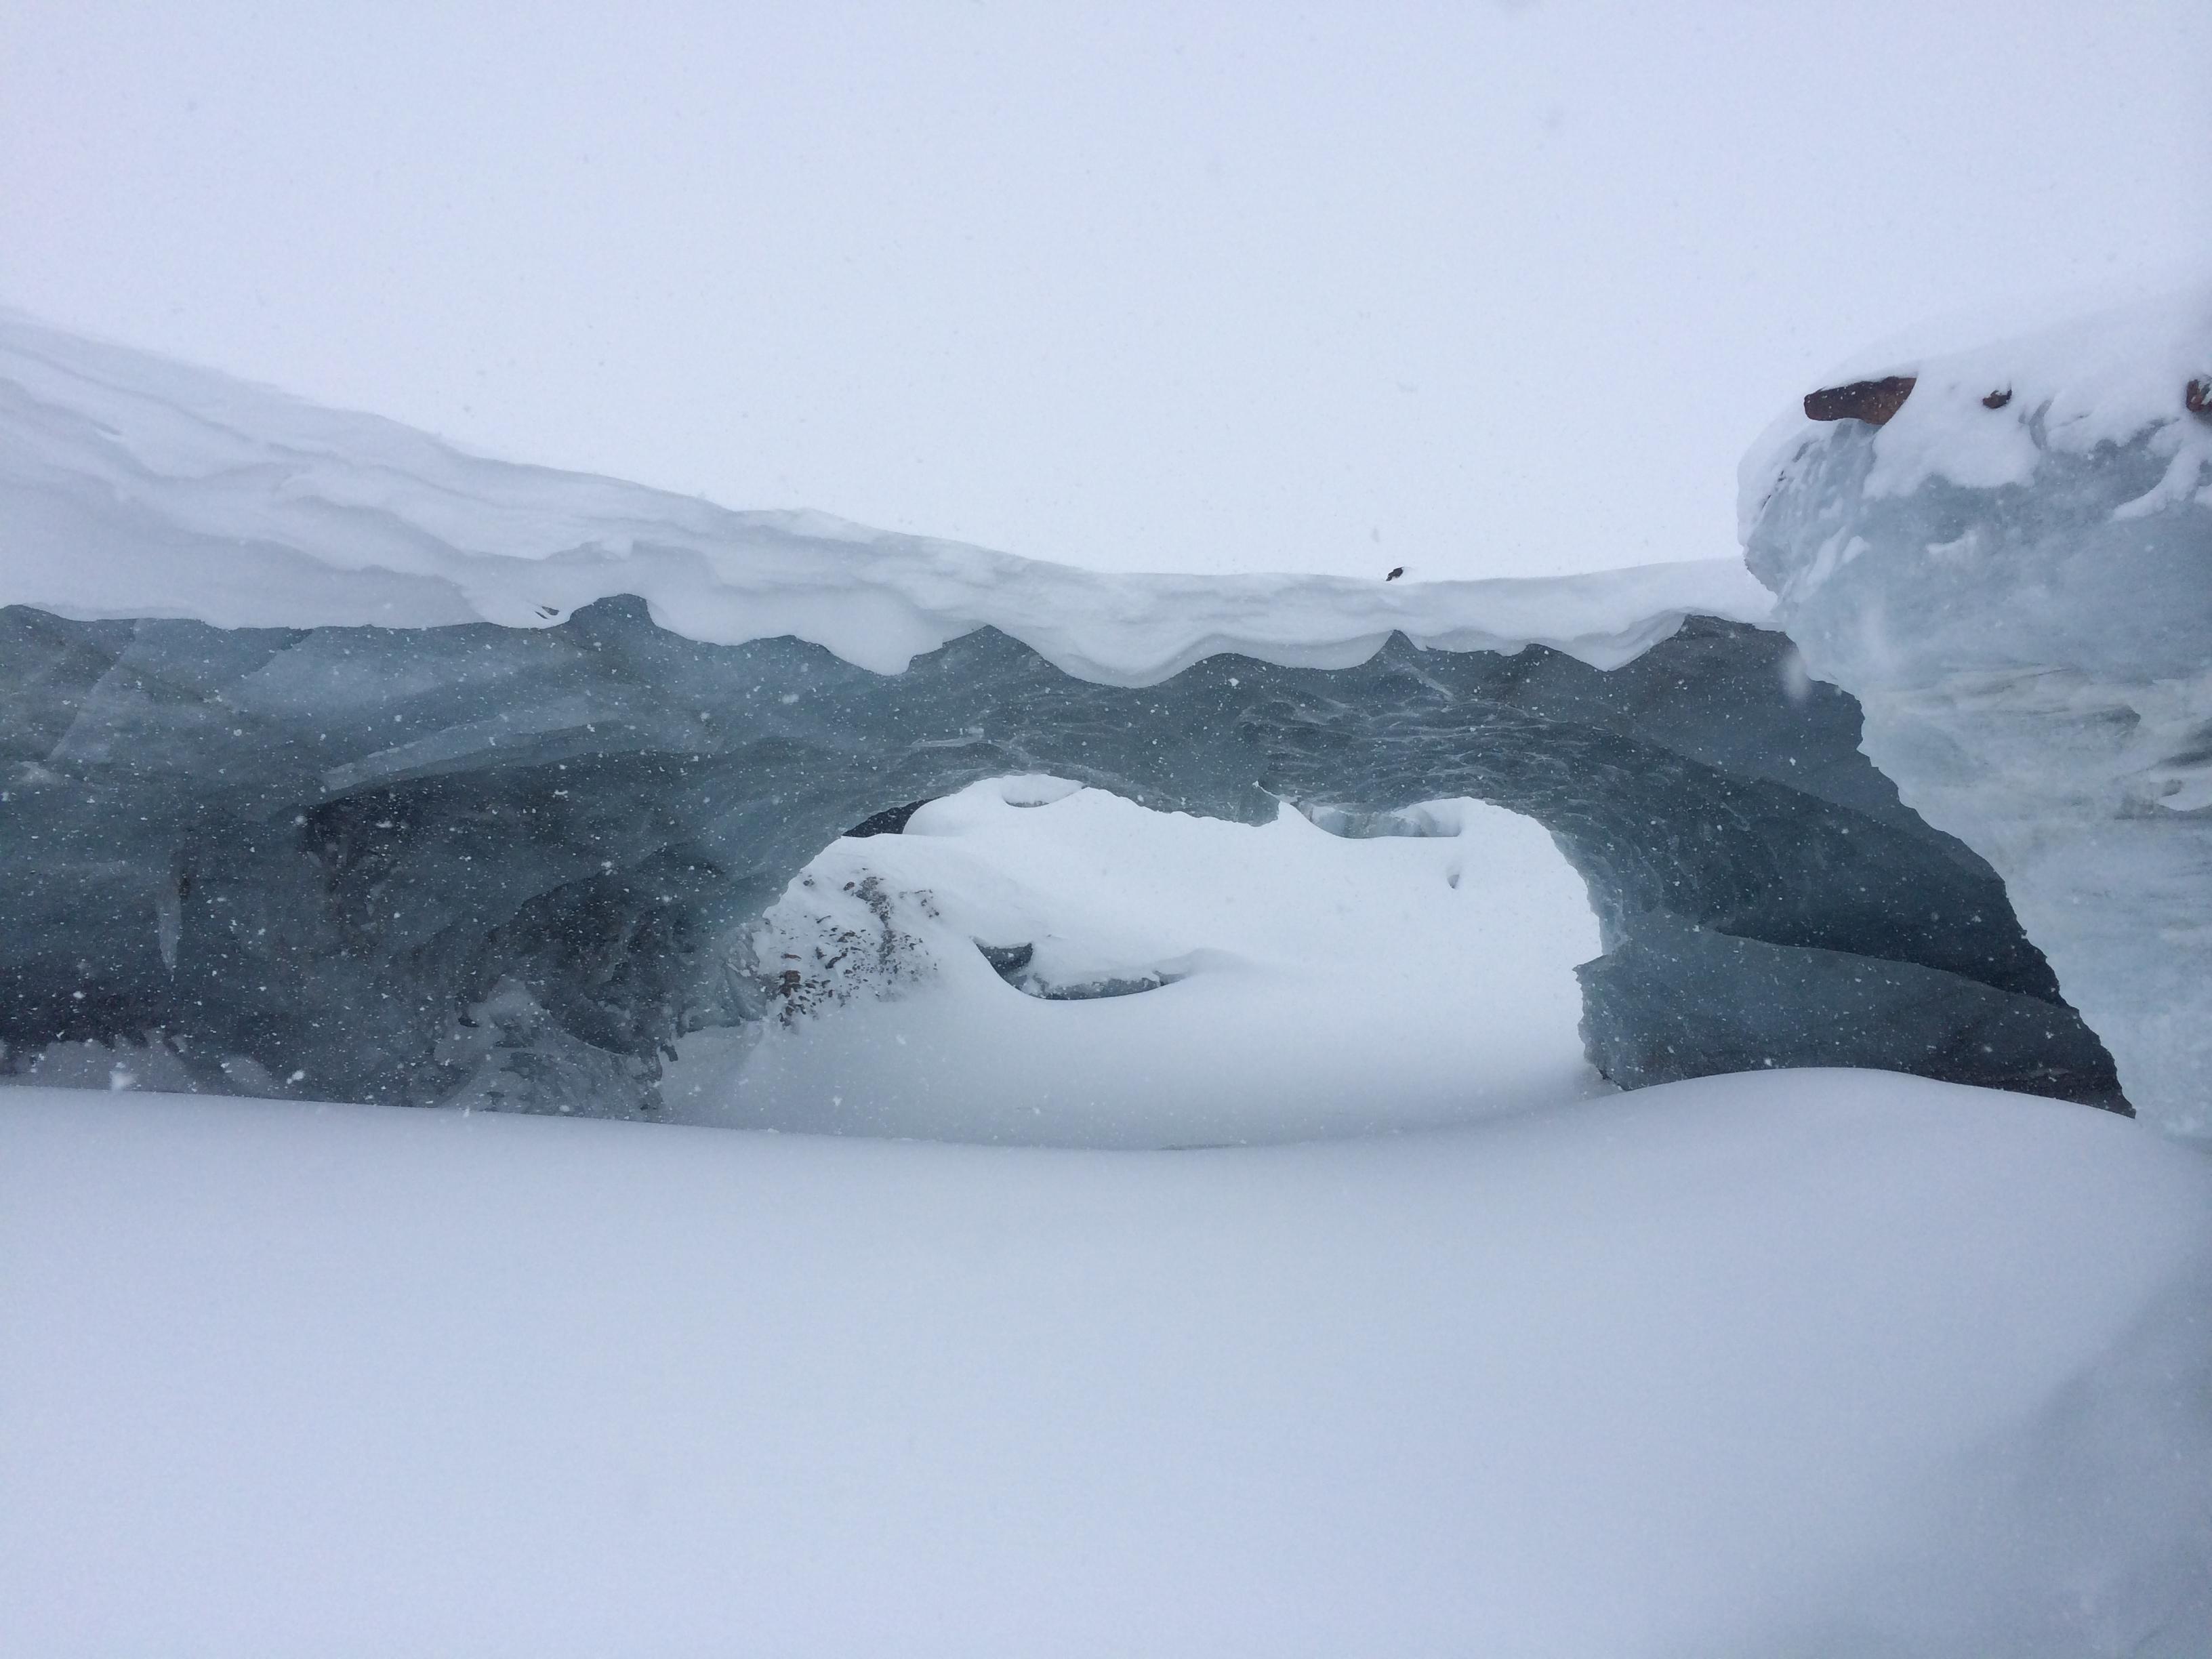 Eingang-Gletscher-Ajoure-Travel